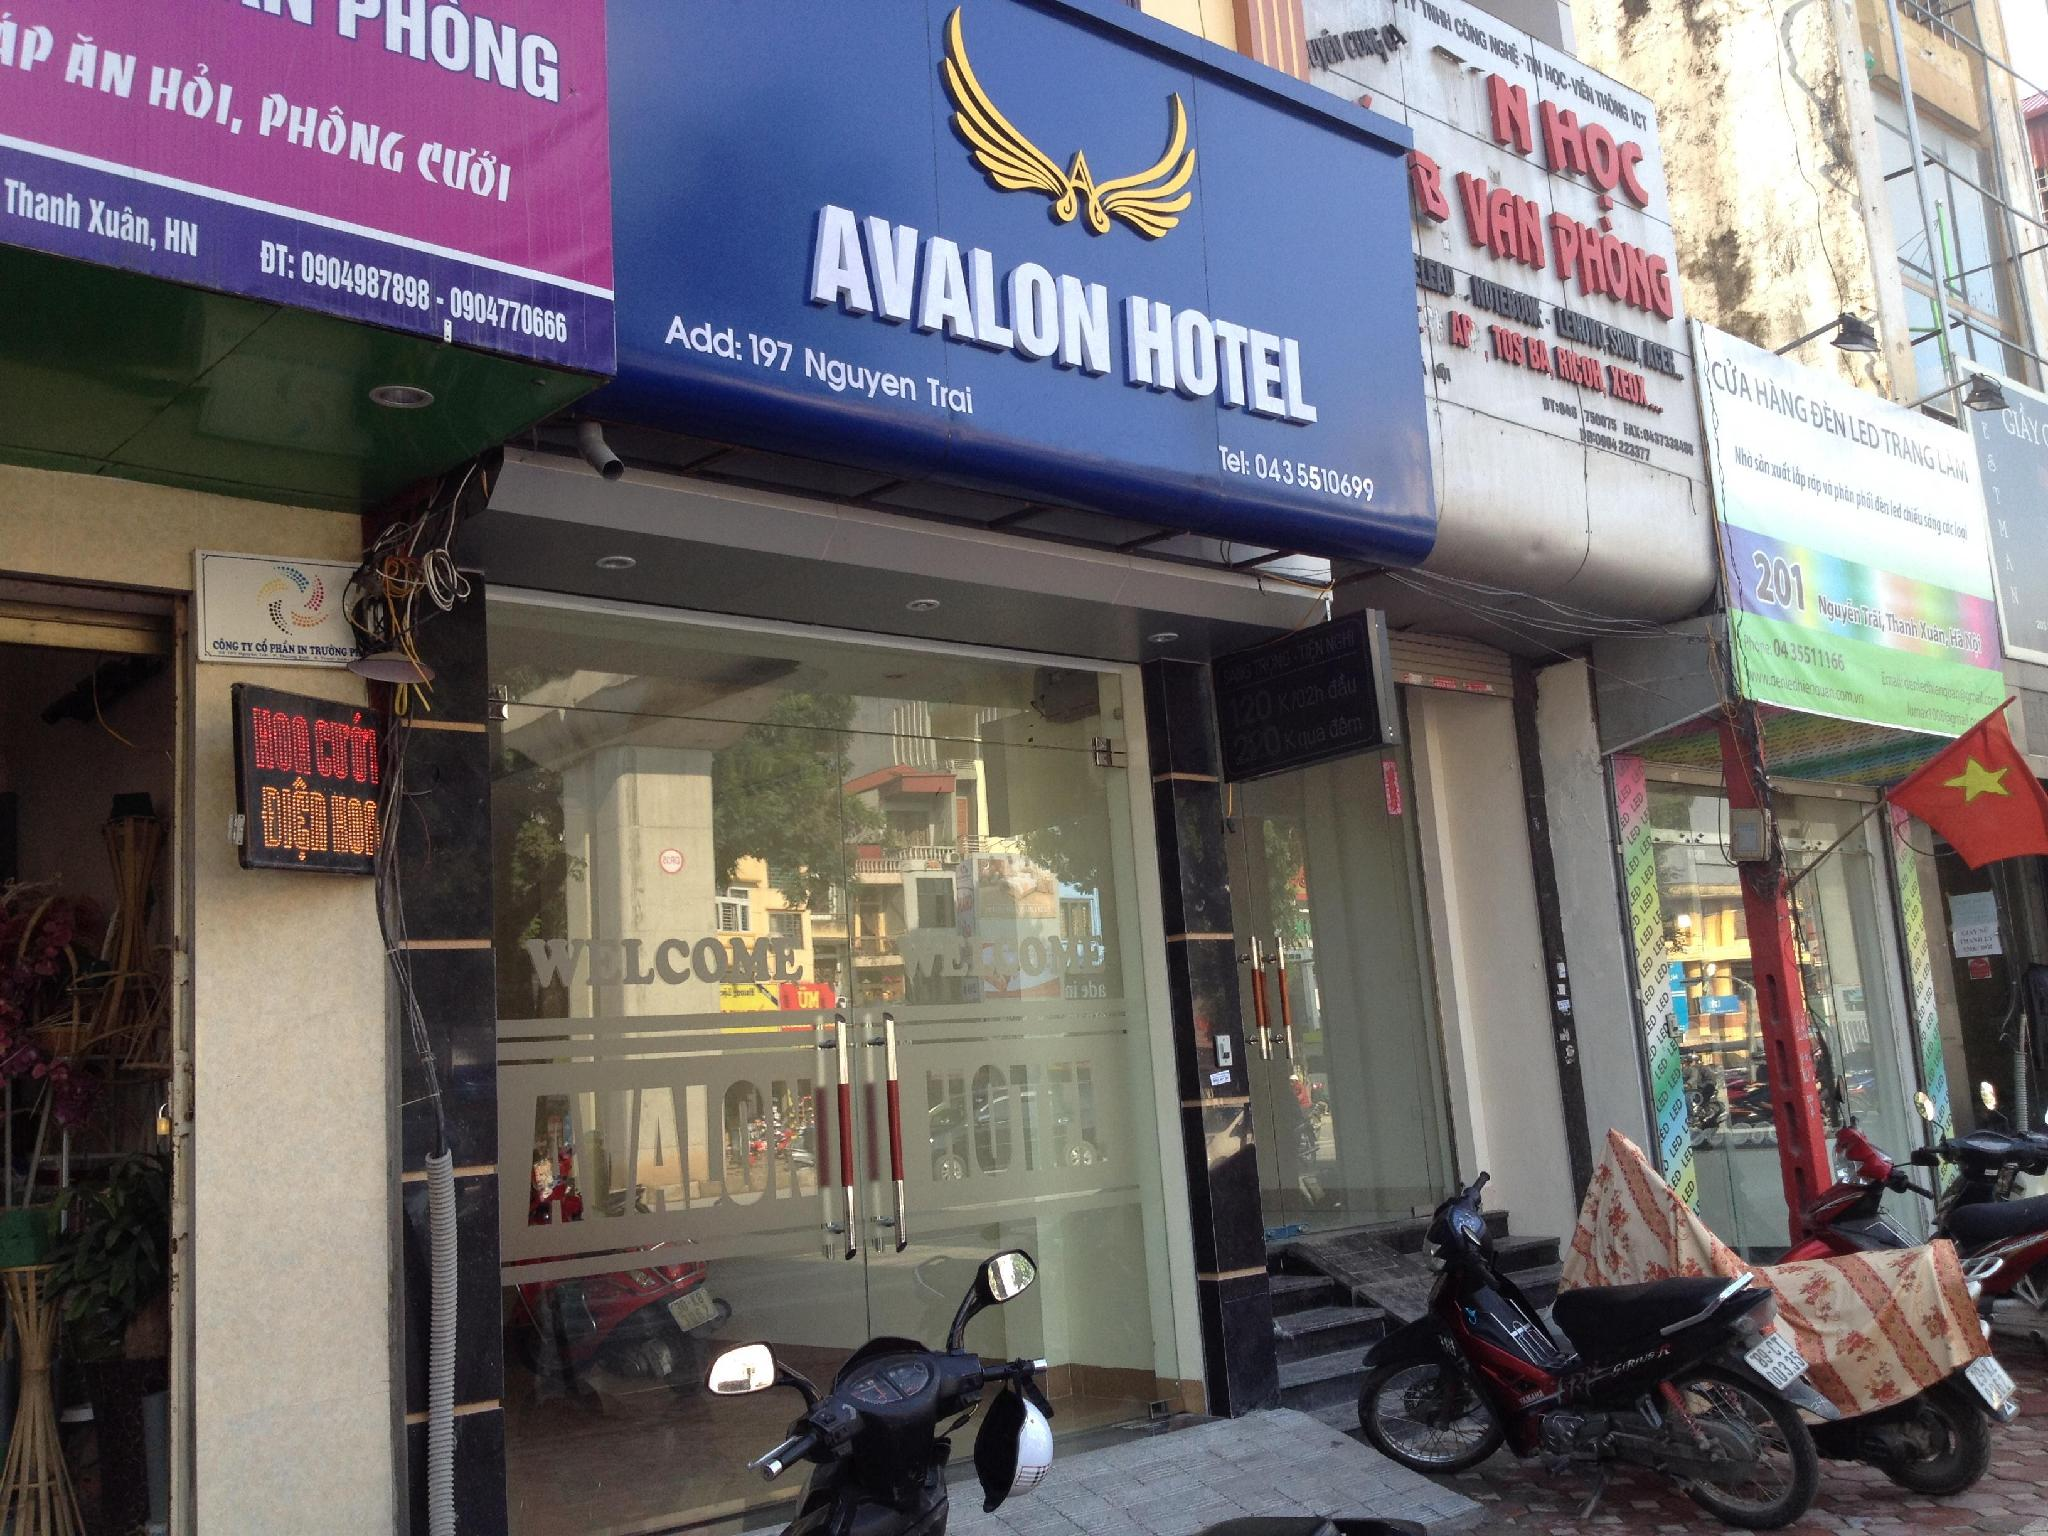 Avalon Hotel, Thanh Xuân